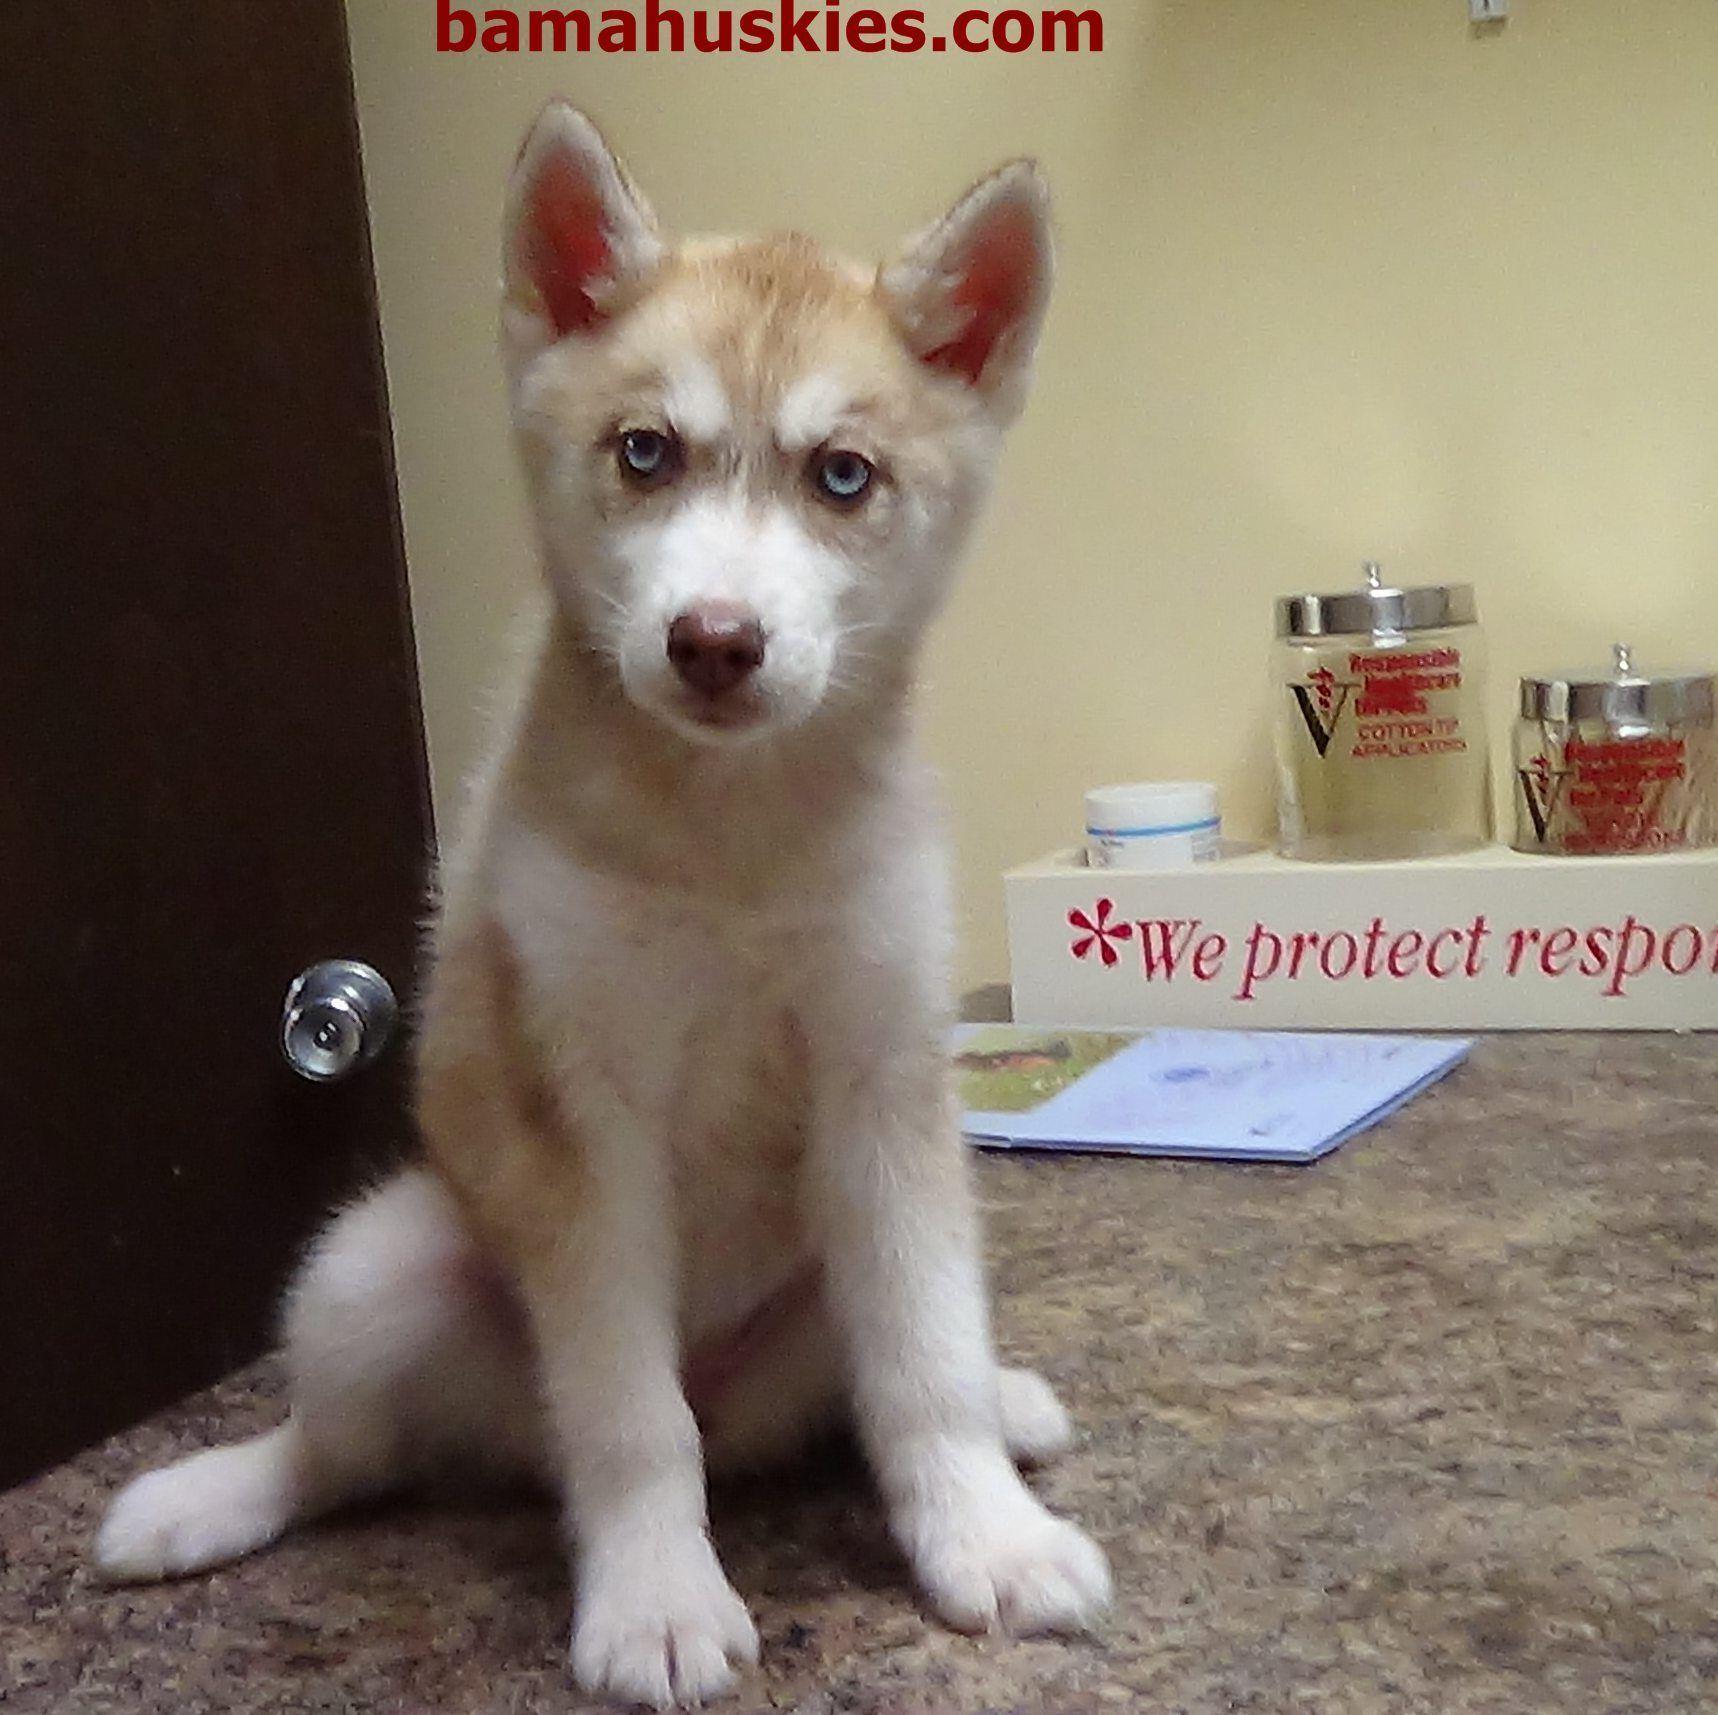 Our New Baby Husky Bama Huskies Babyhusky Our New Baby Husky